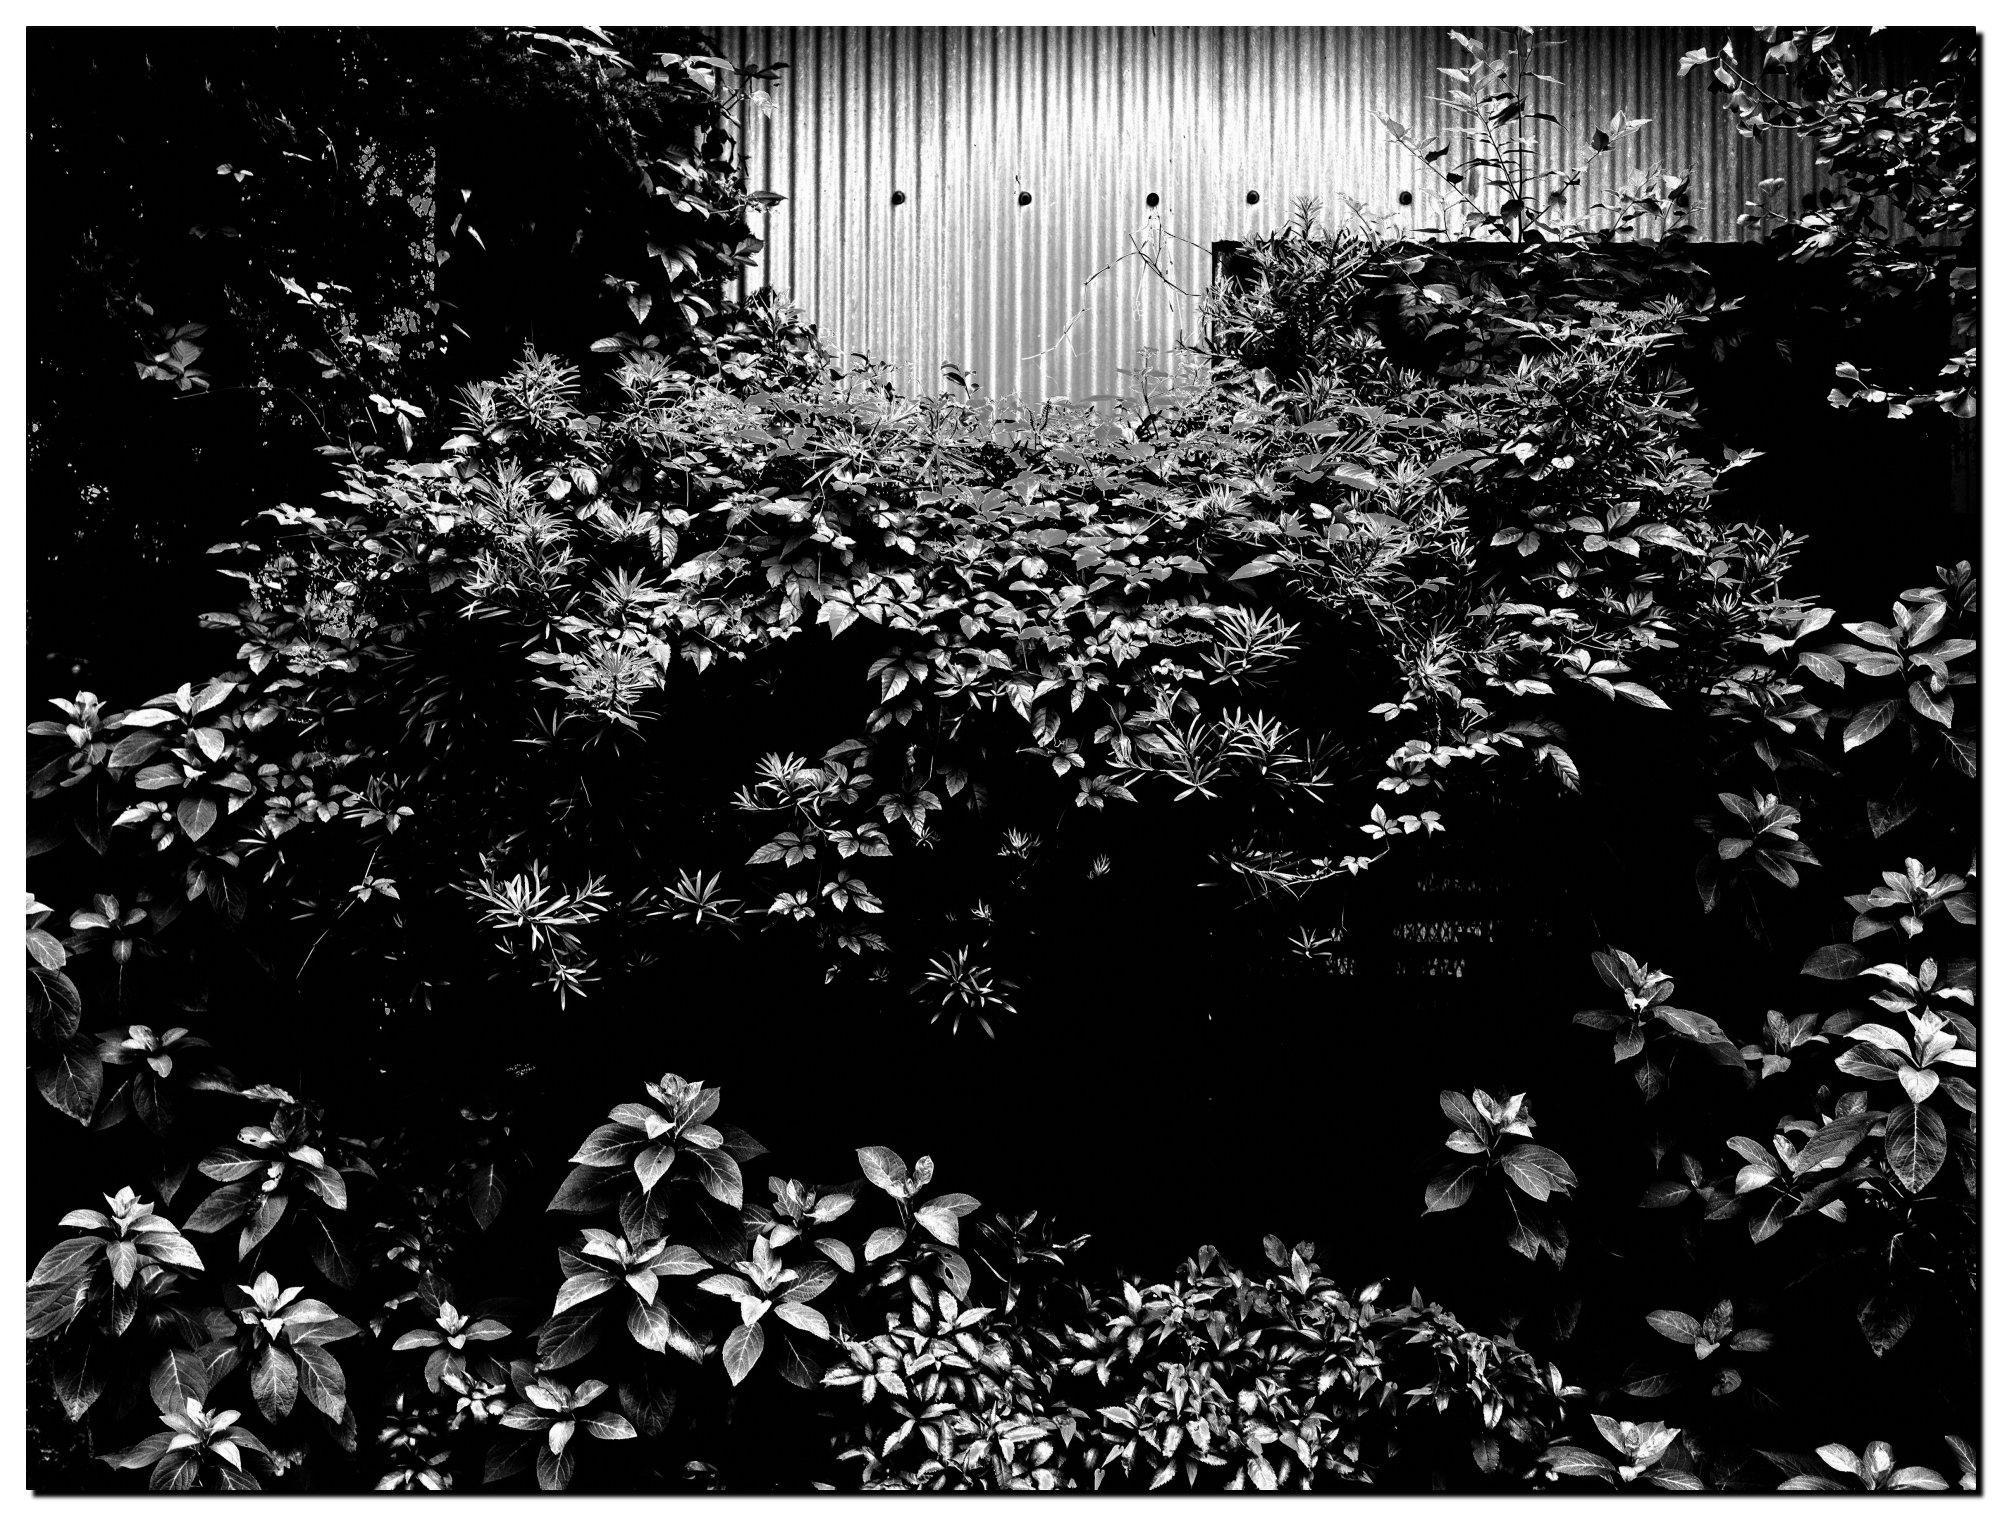 LR6-DP2Q0287-Edit-3-1.jpg